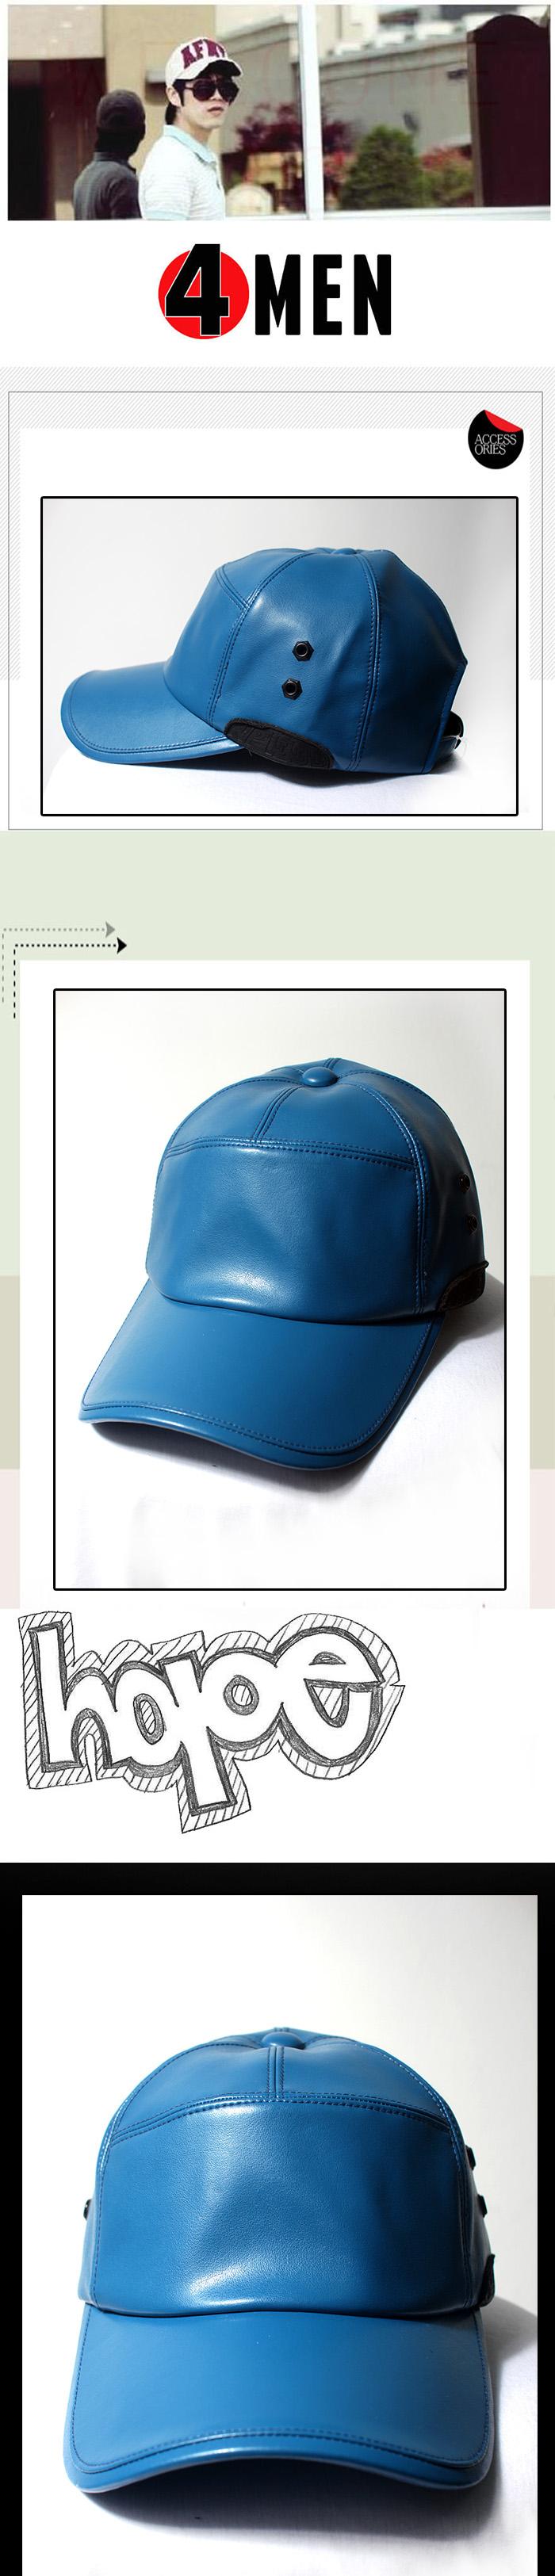 Nón da xanh dương nf065 - 1